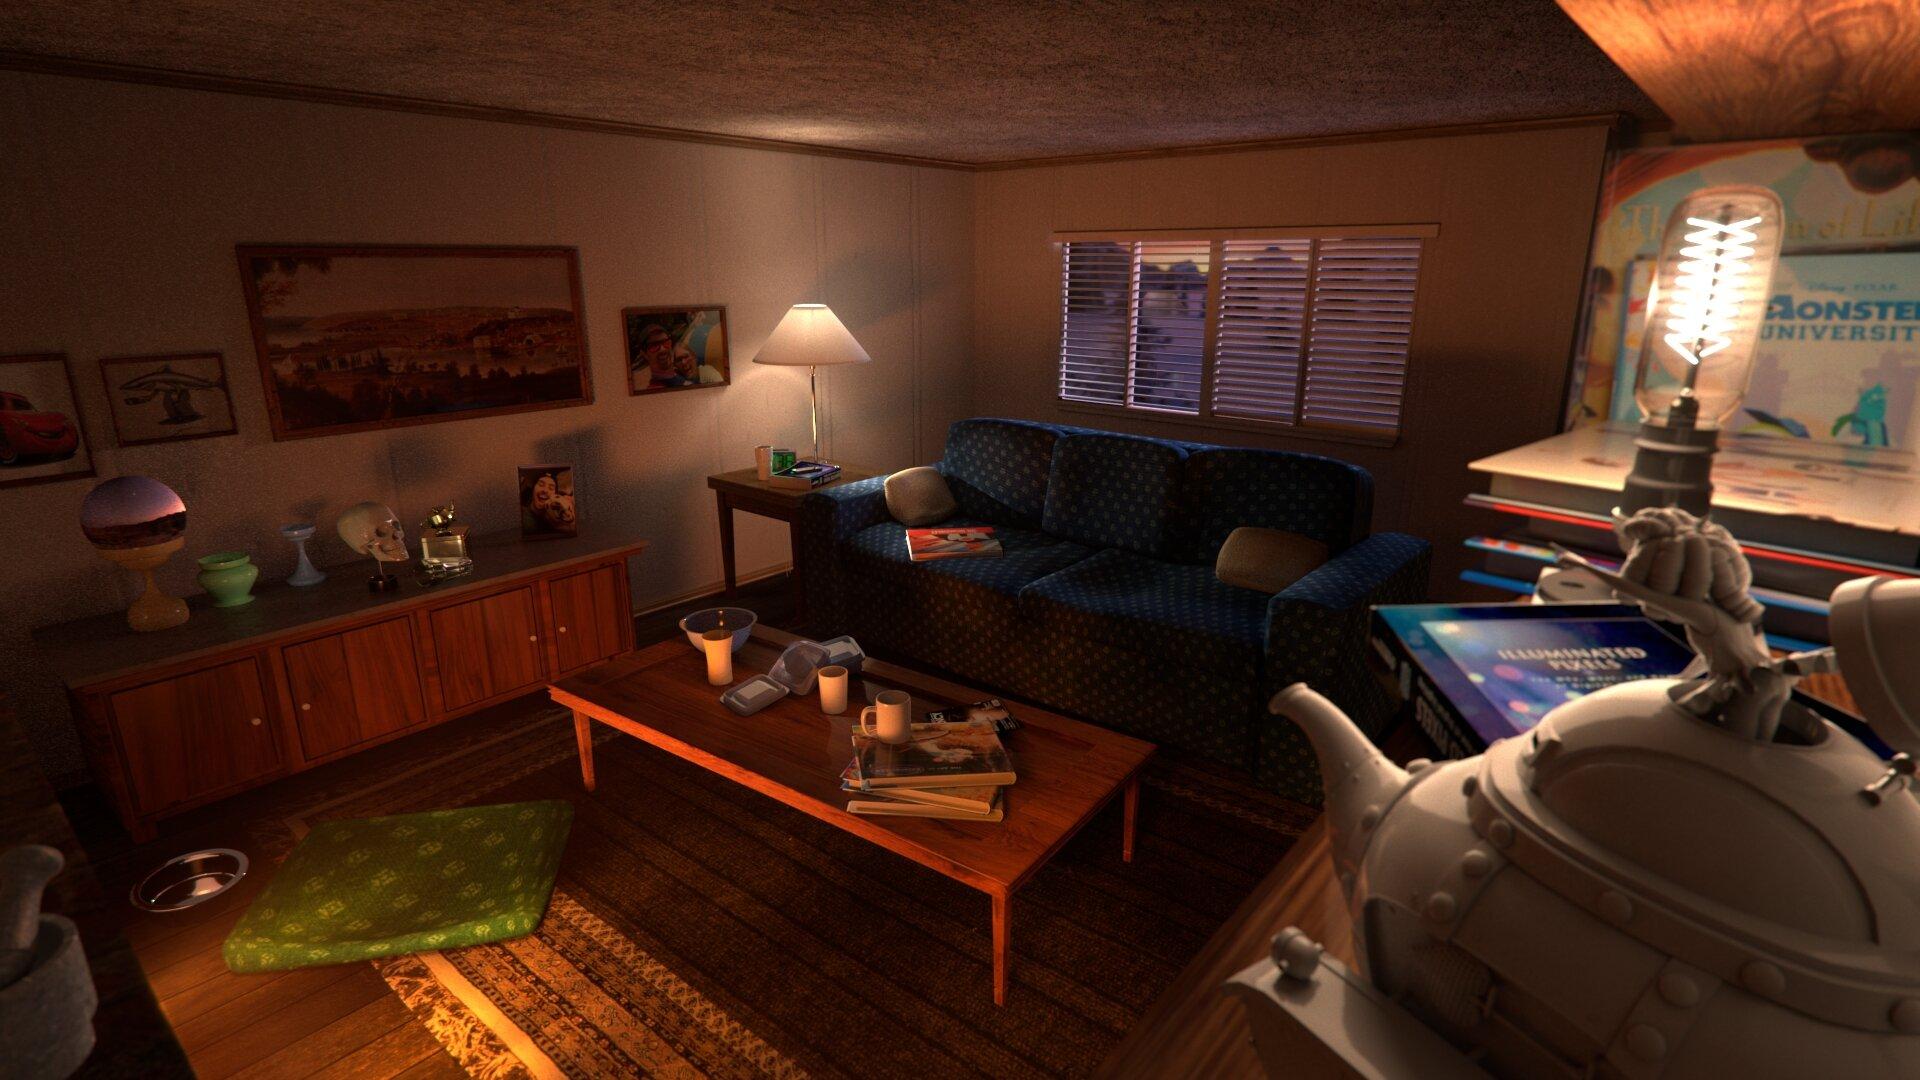 Living Room Lighting Study